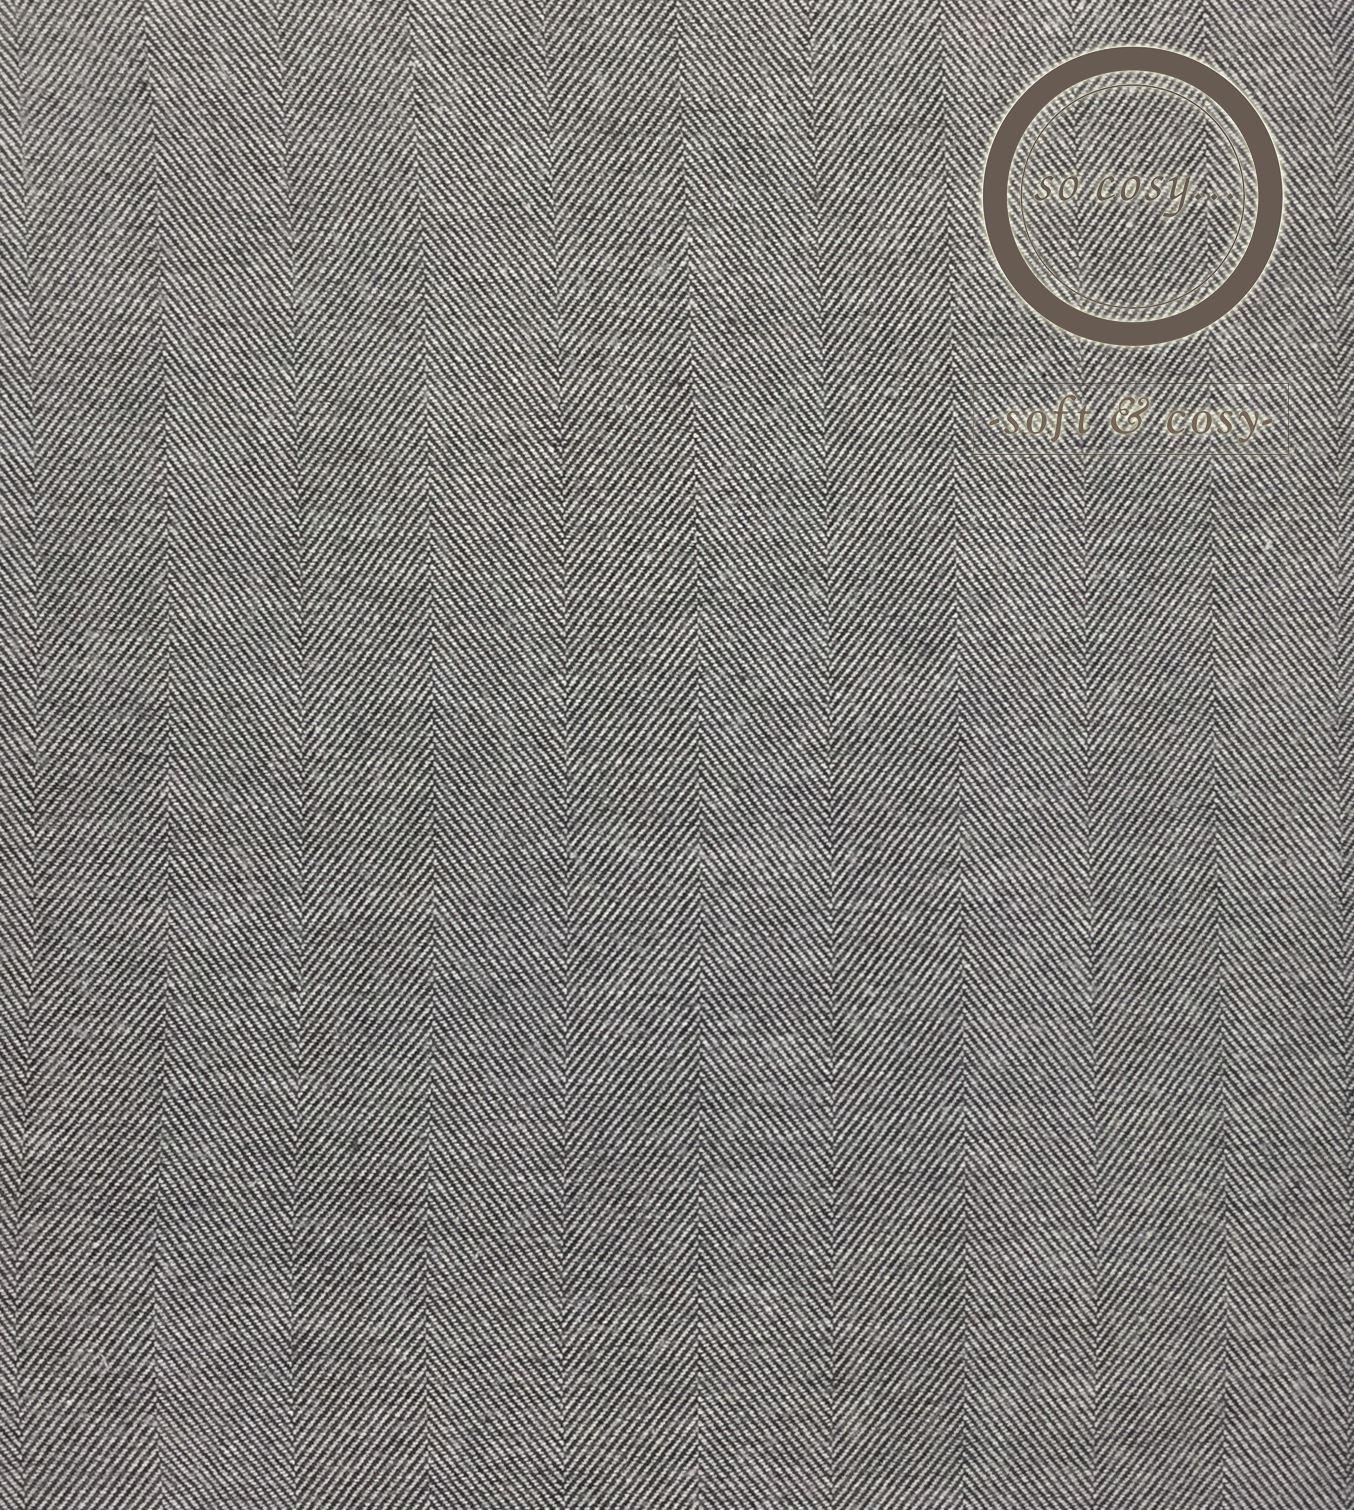 Herringbone-Tejido-Gris-100-Algodon-Cepillado-Franela-flanelita-duvet-cover-set miniatura 4